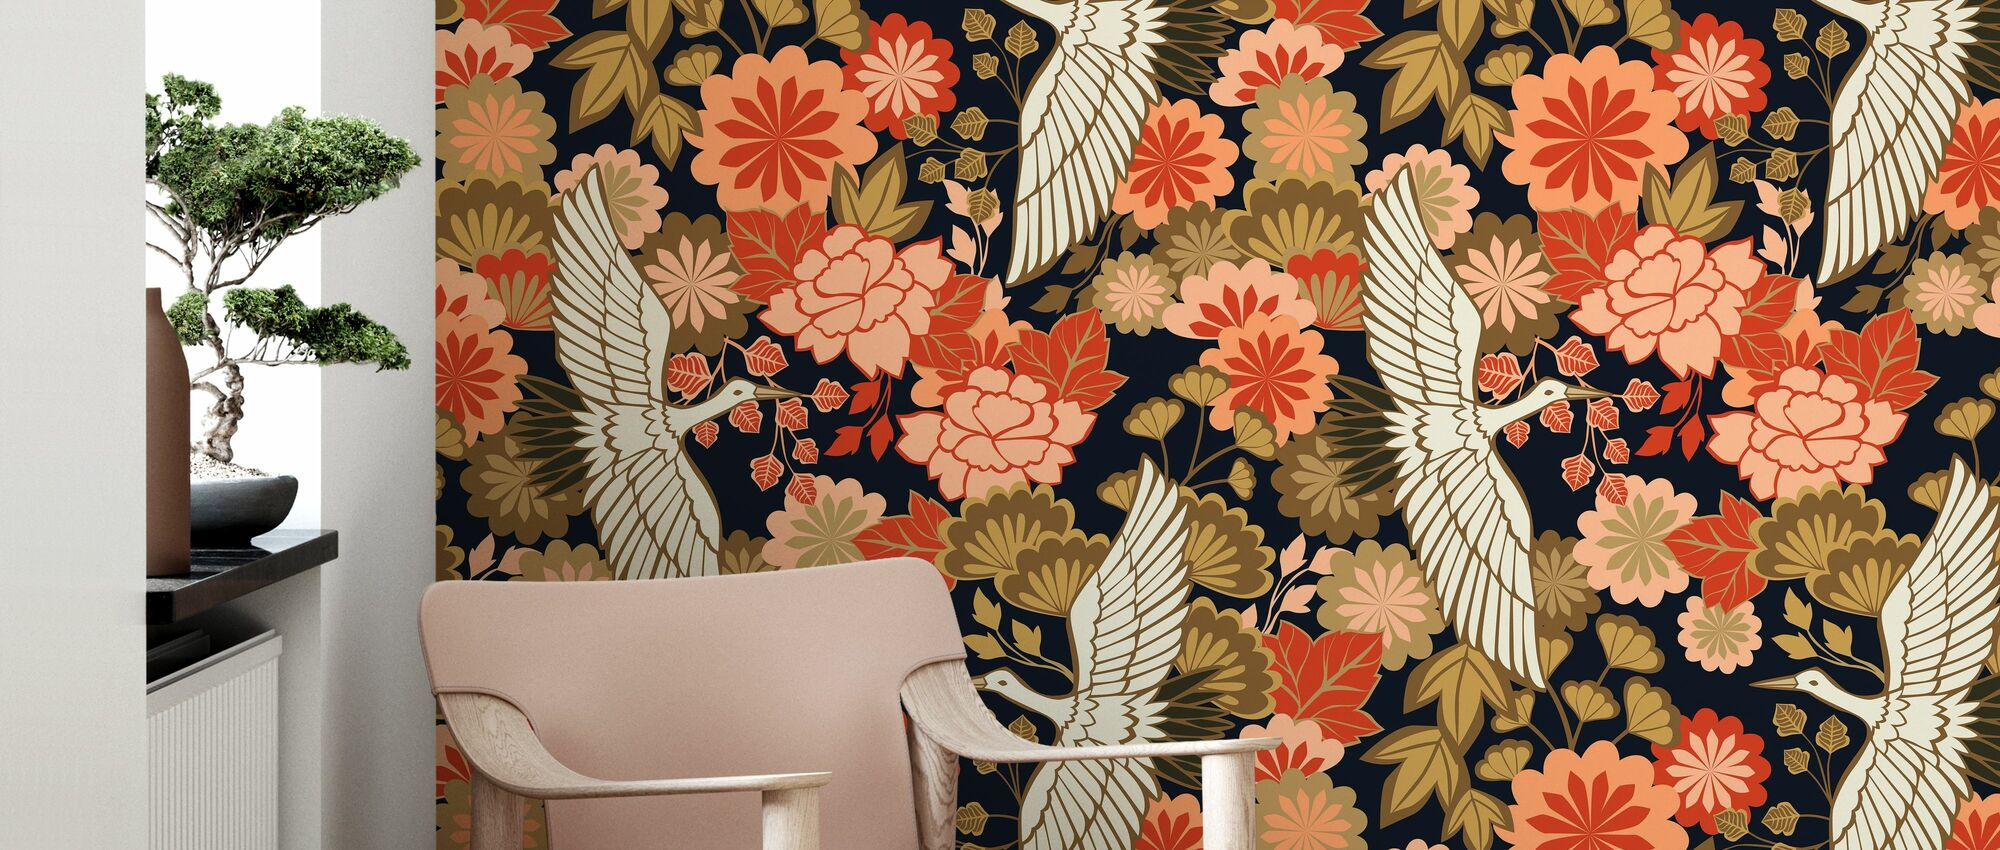 Cranes and Chrysanthemums - Black - Wallpaper - Living Room